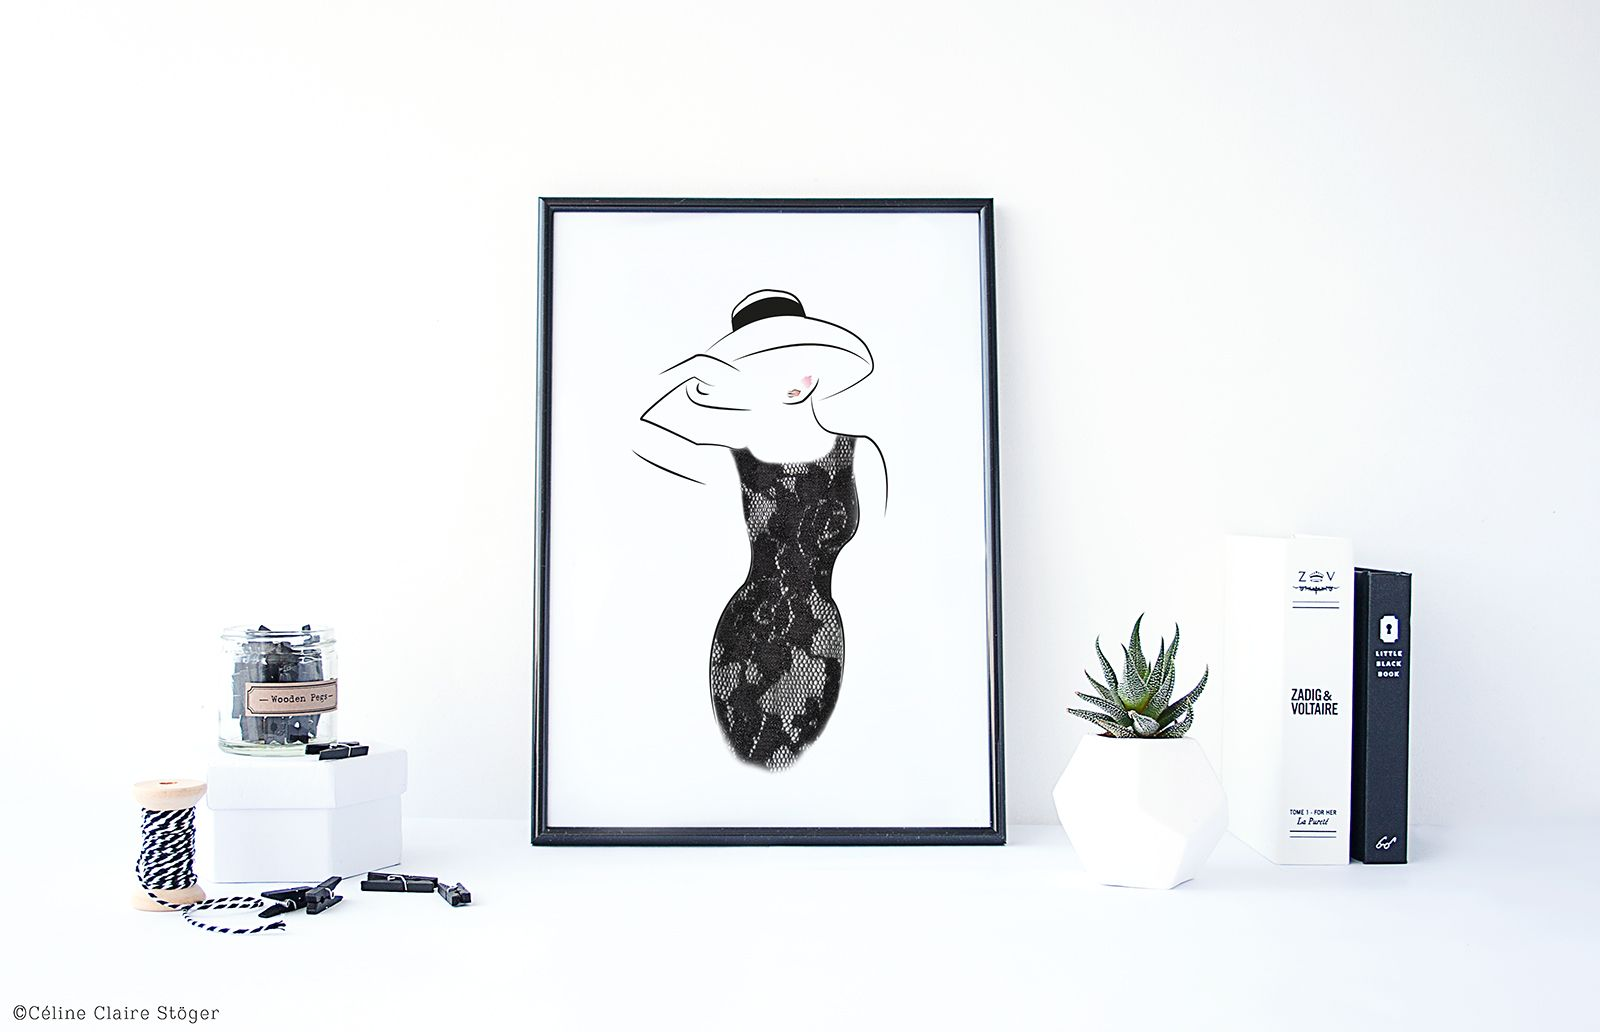 """Lady in Black"" Grafik - Céline Claire - Graphic Design & Digital Art #illustration #lady #ladyinblack #littleblackdress #fashion #fashionillustration #poster #artprint"